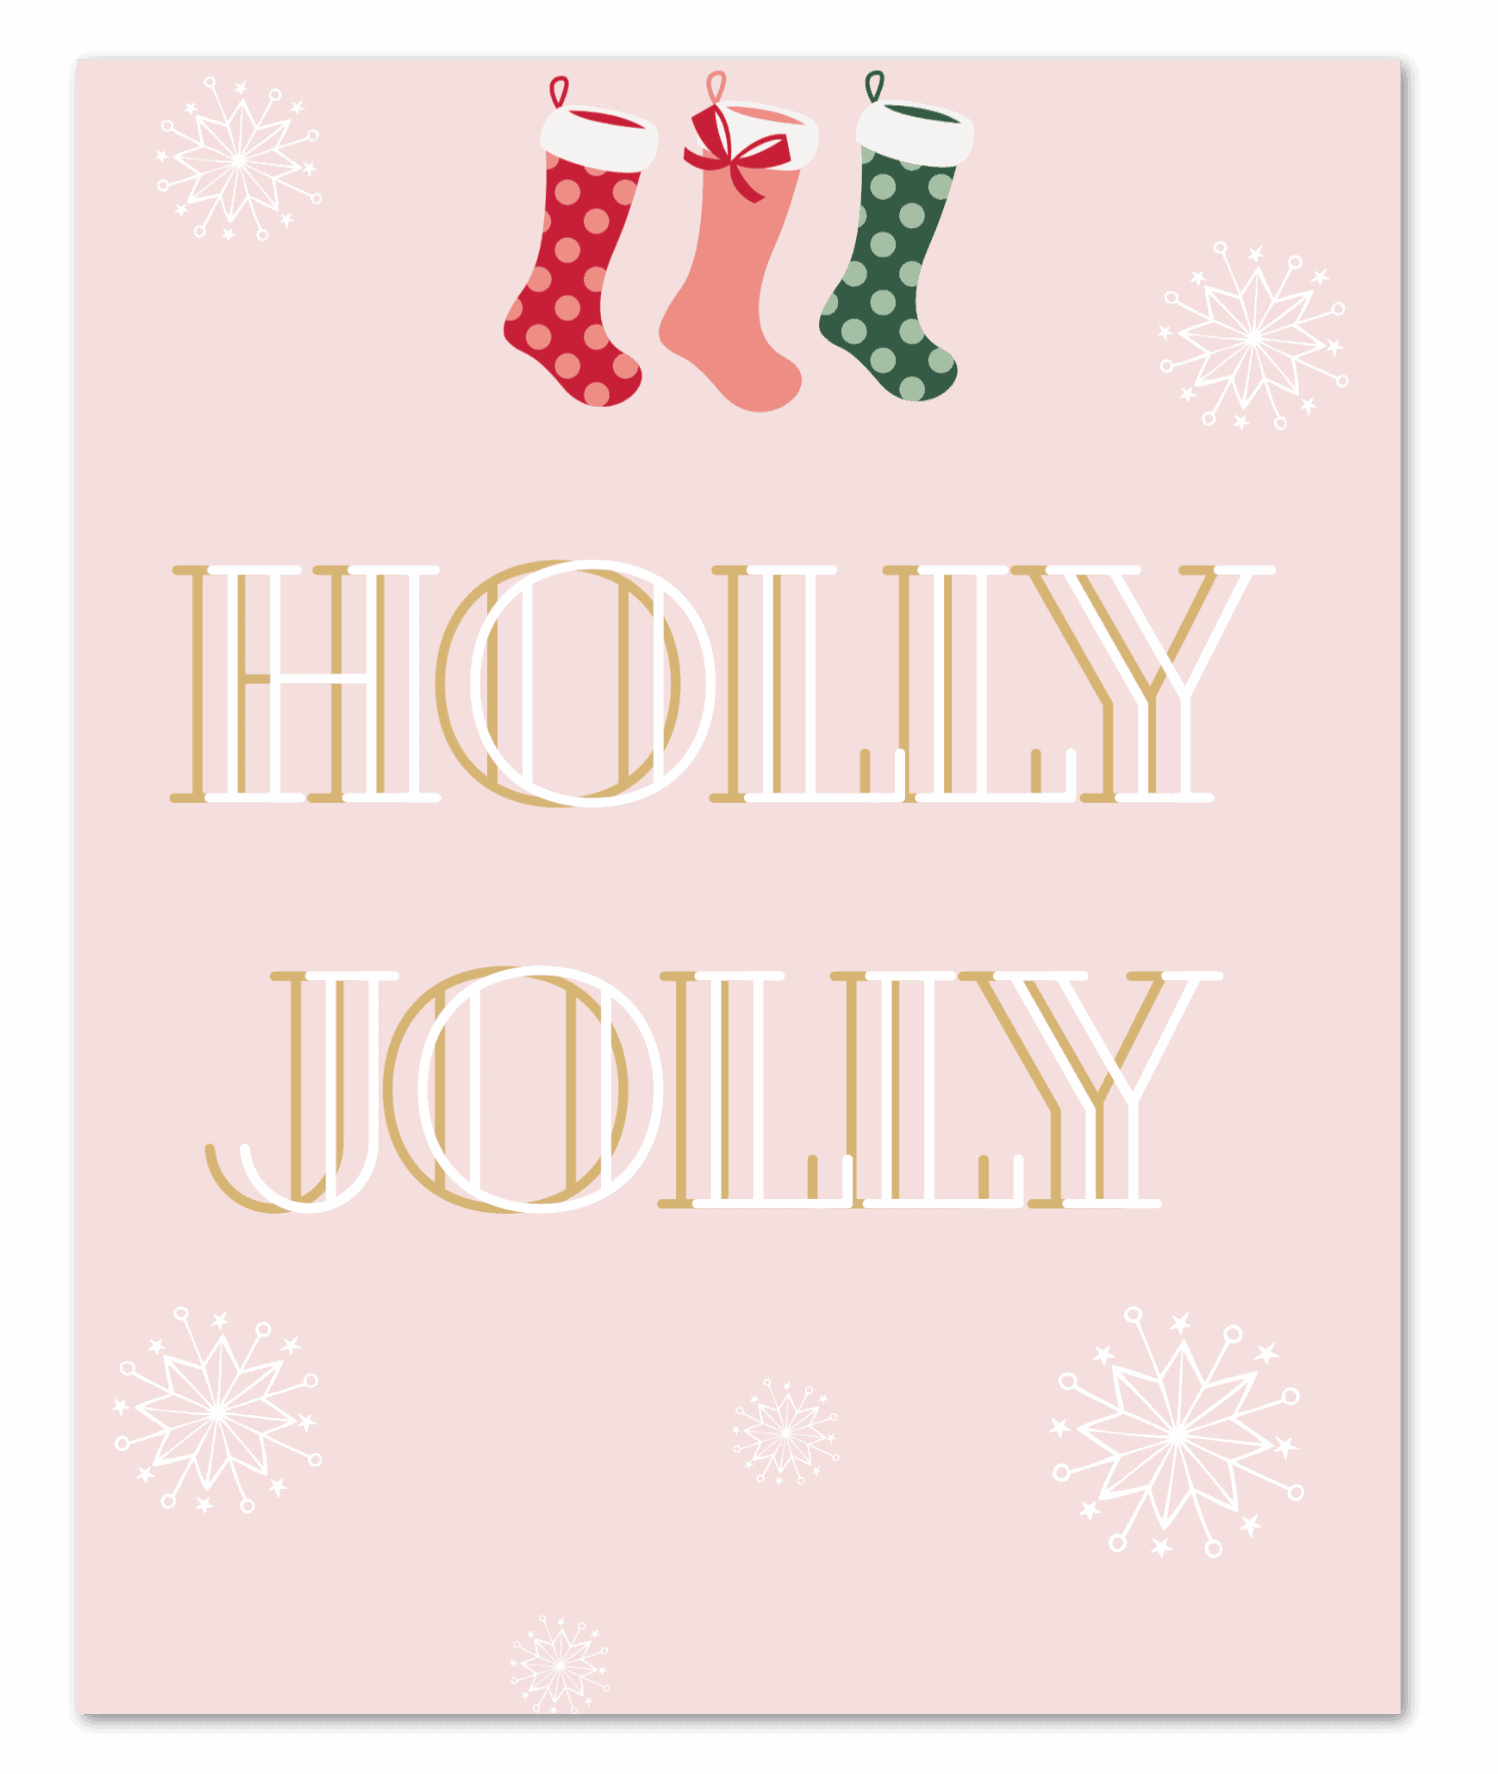 Holly Jolly Drop Shadow 2